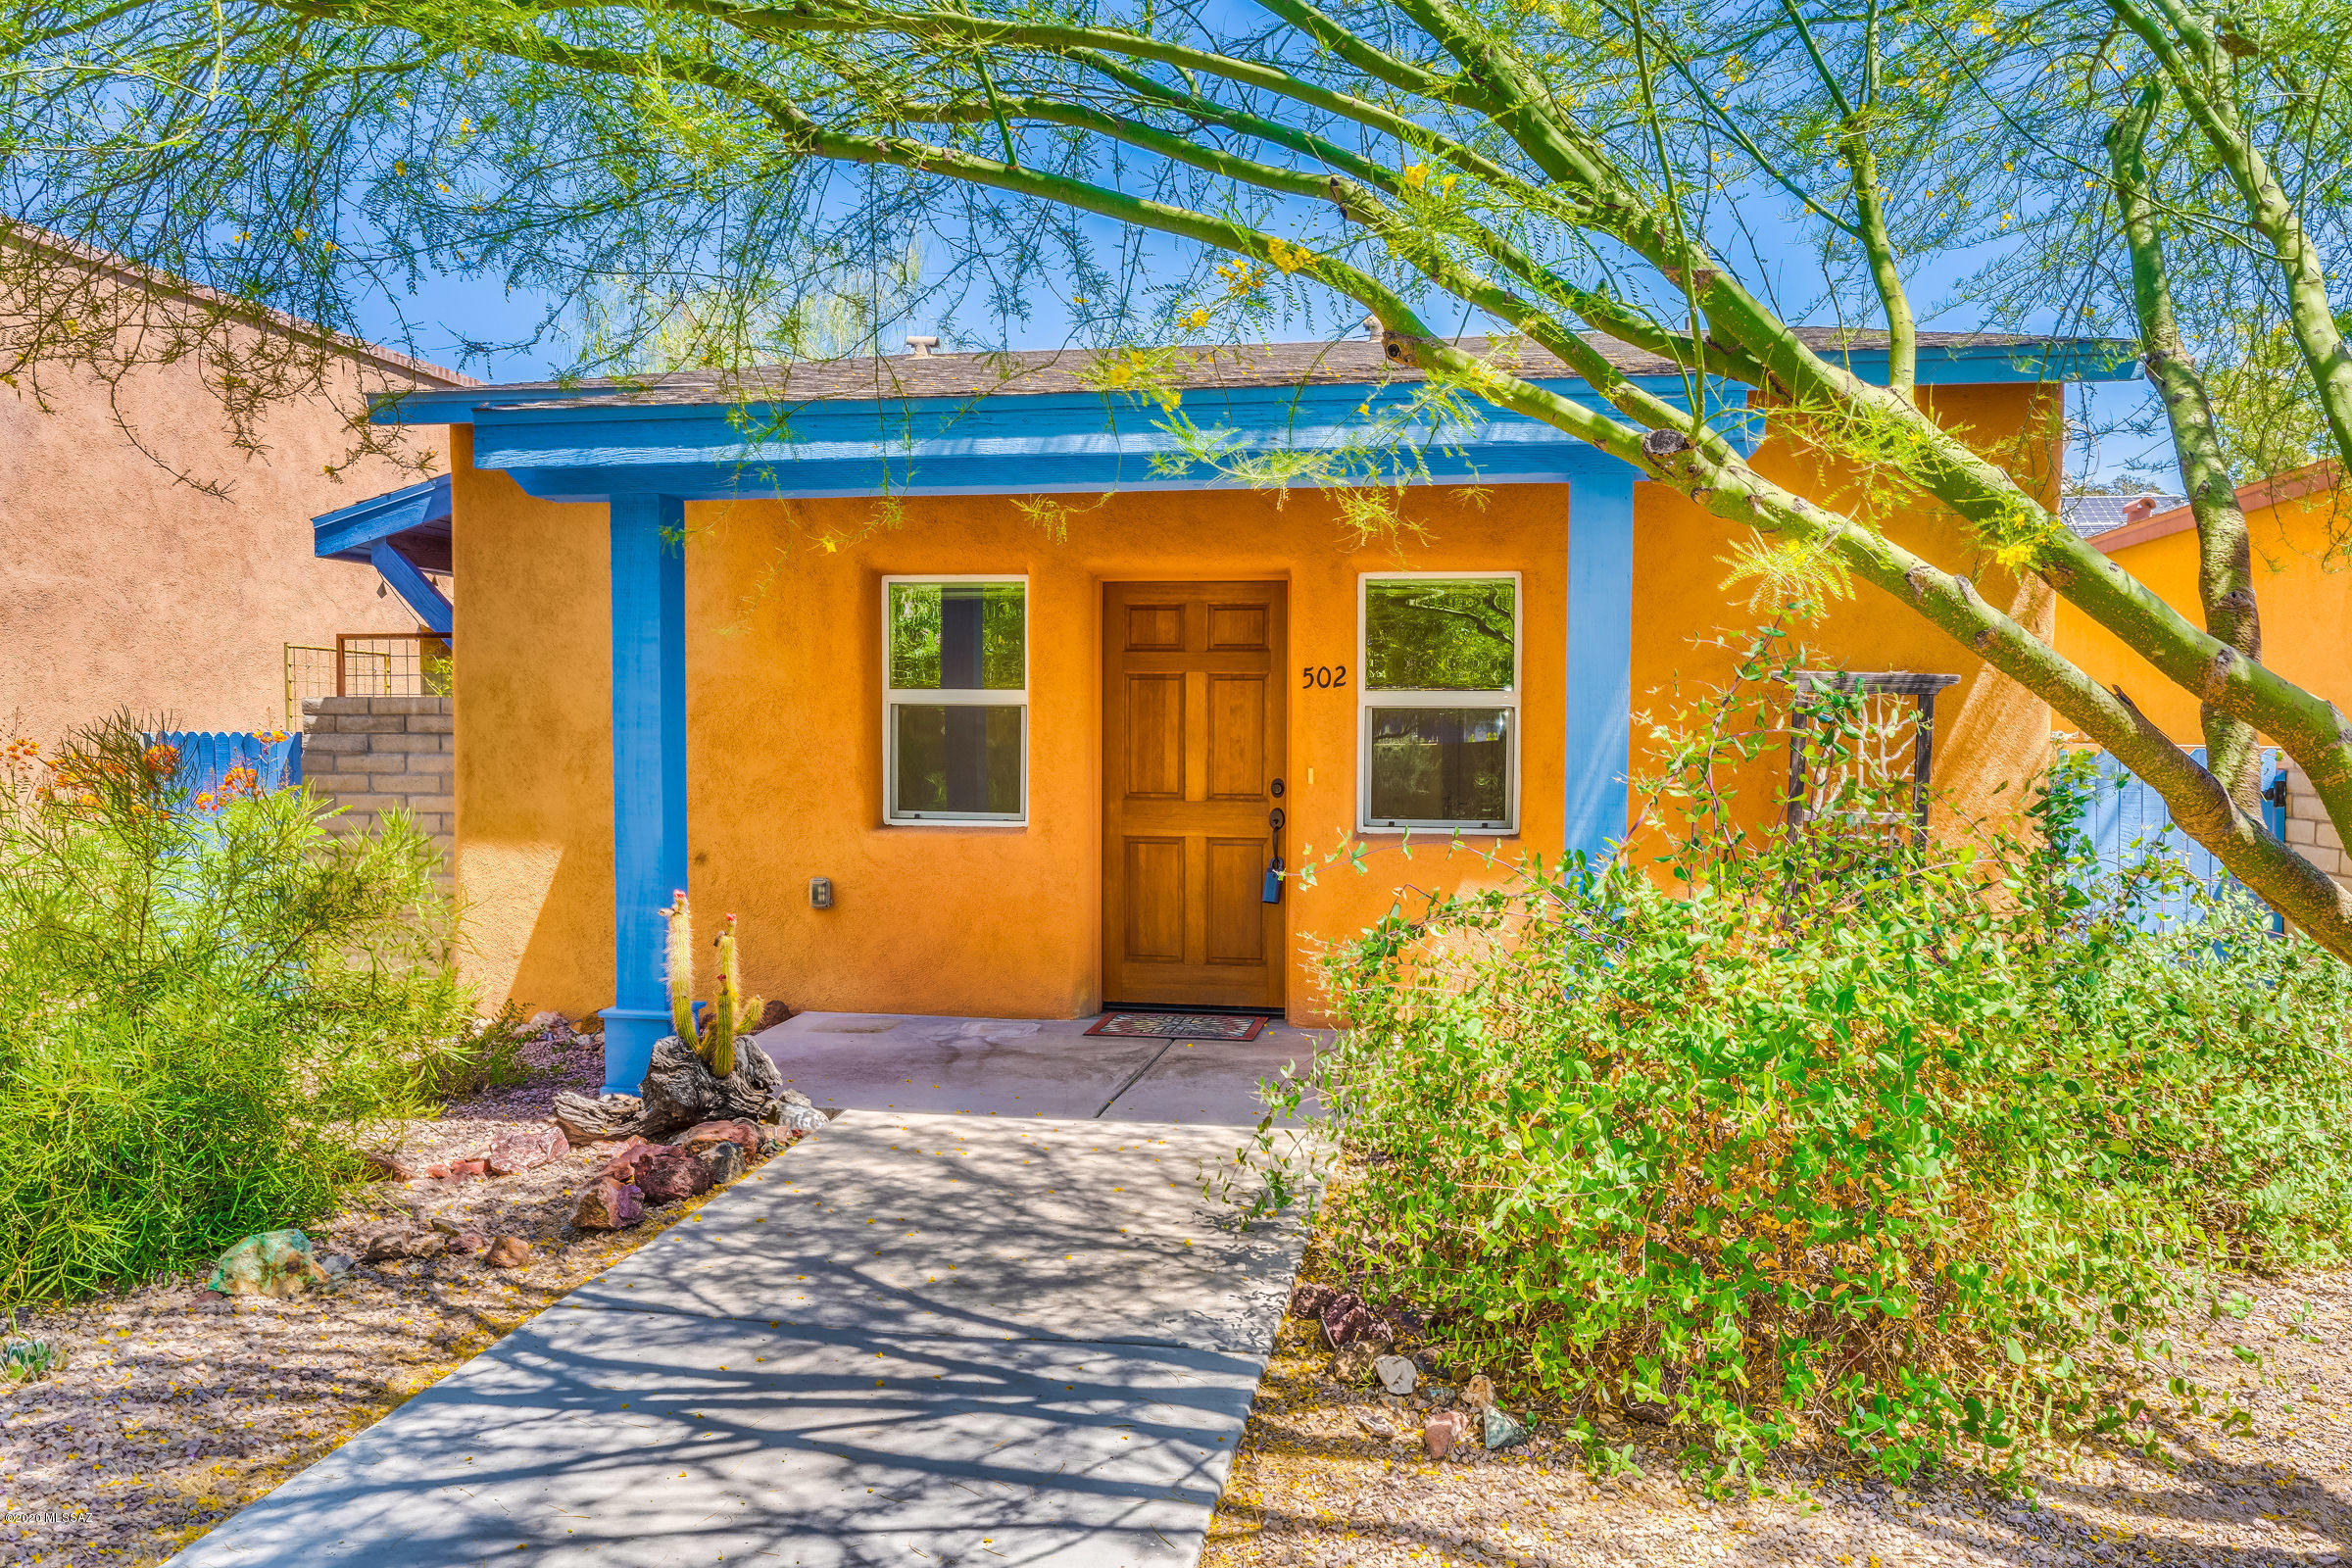 Photo of 502 E Historic Street, Tucson, AZ 85701